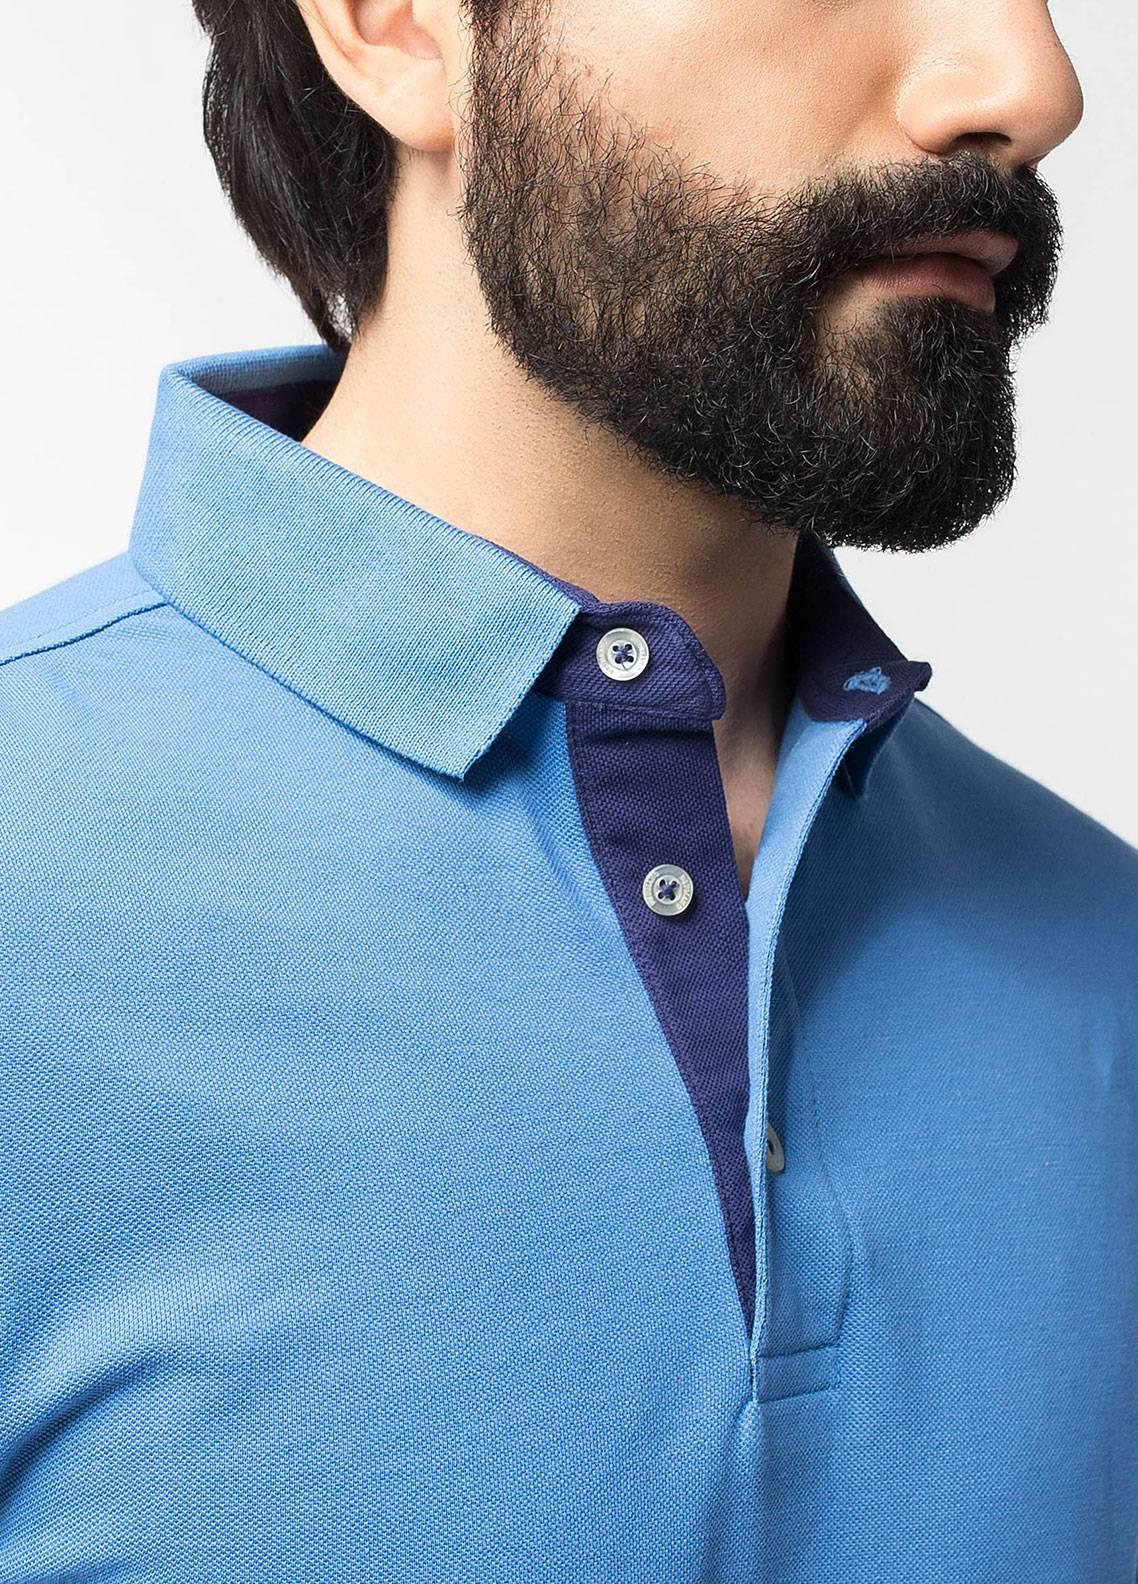 Brumano Cotton Polo Shirts for Men - Blue BRM-44-331